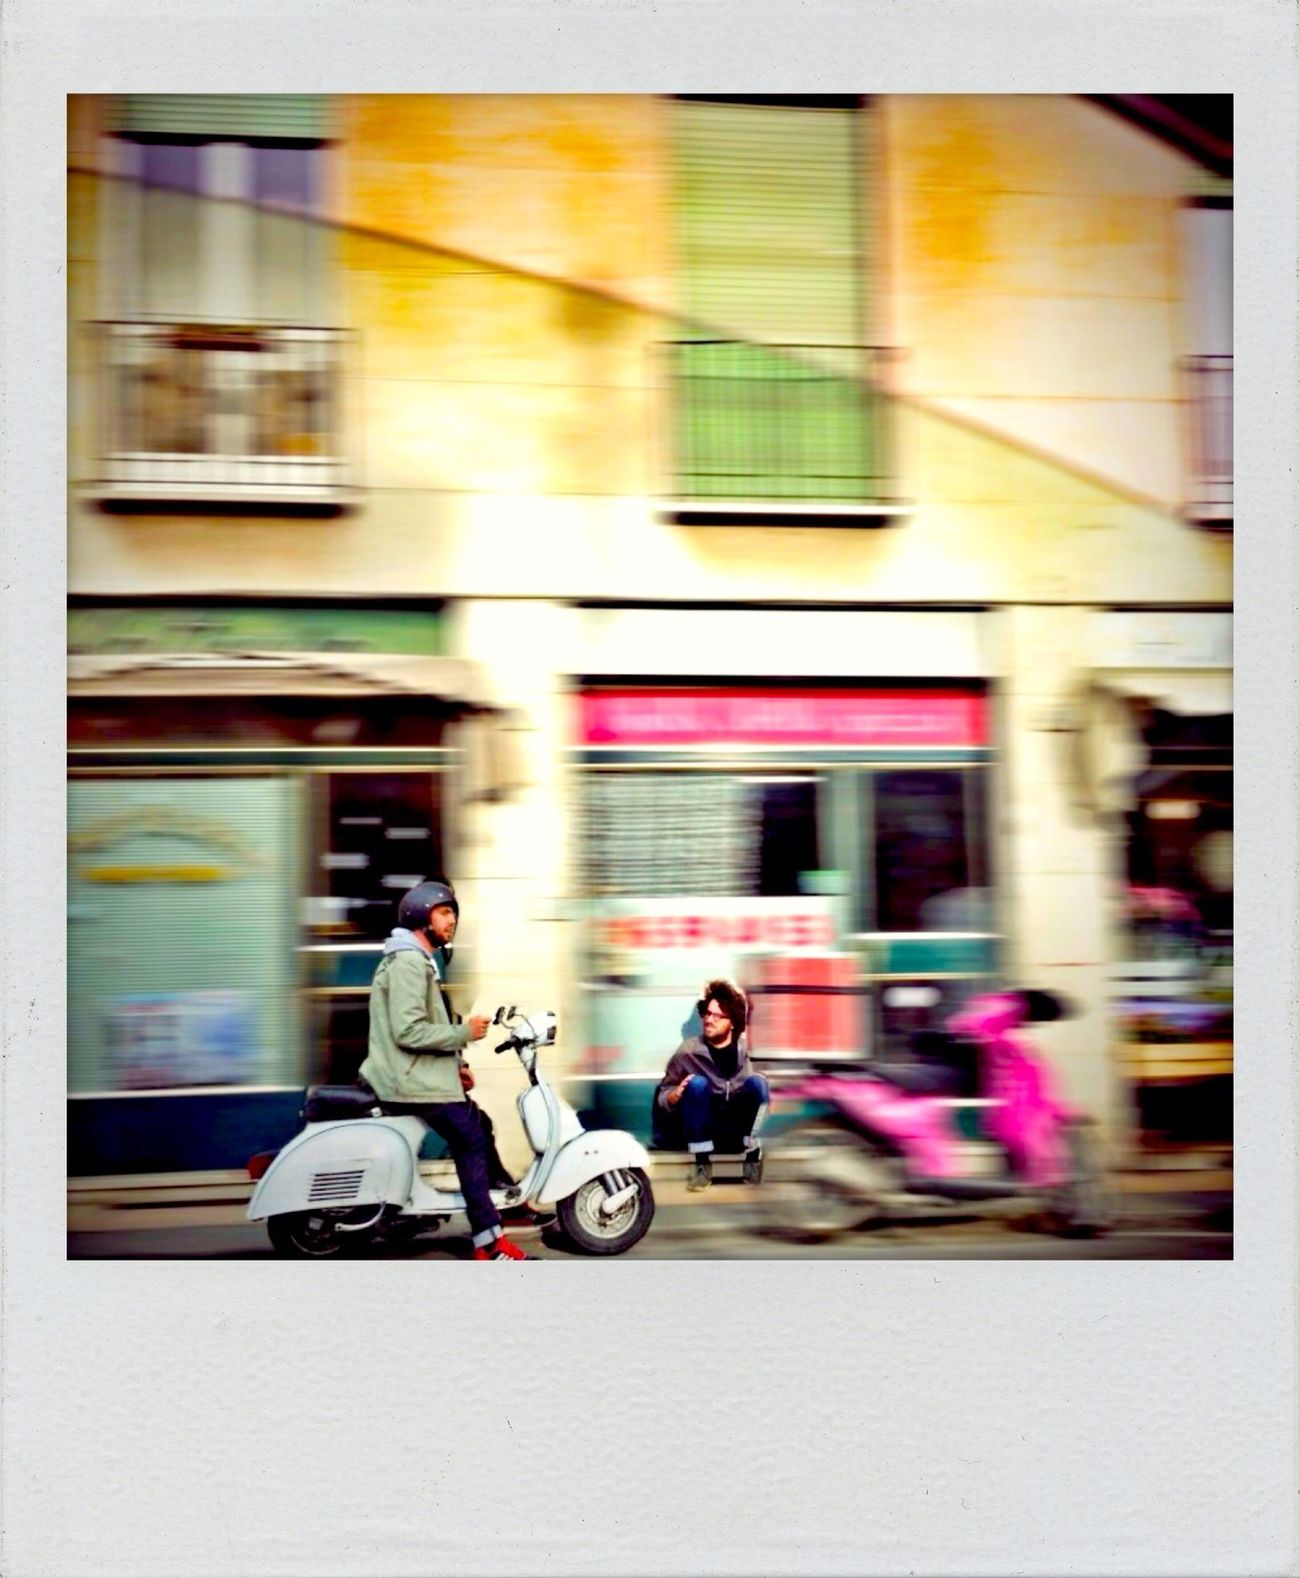 Streetphotography VESPA Bella Street Life Saturday